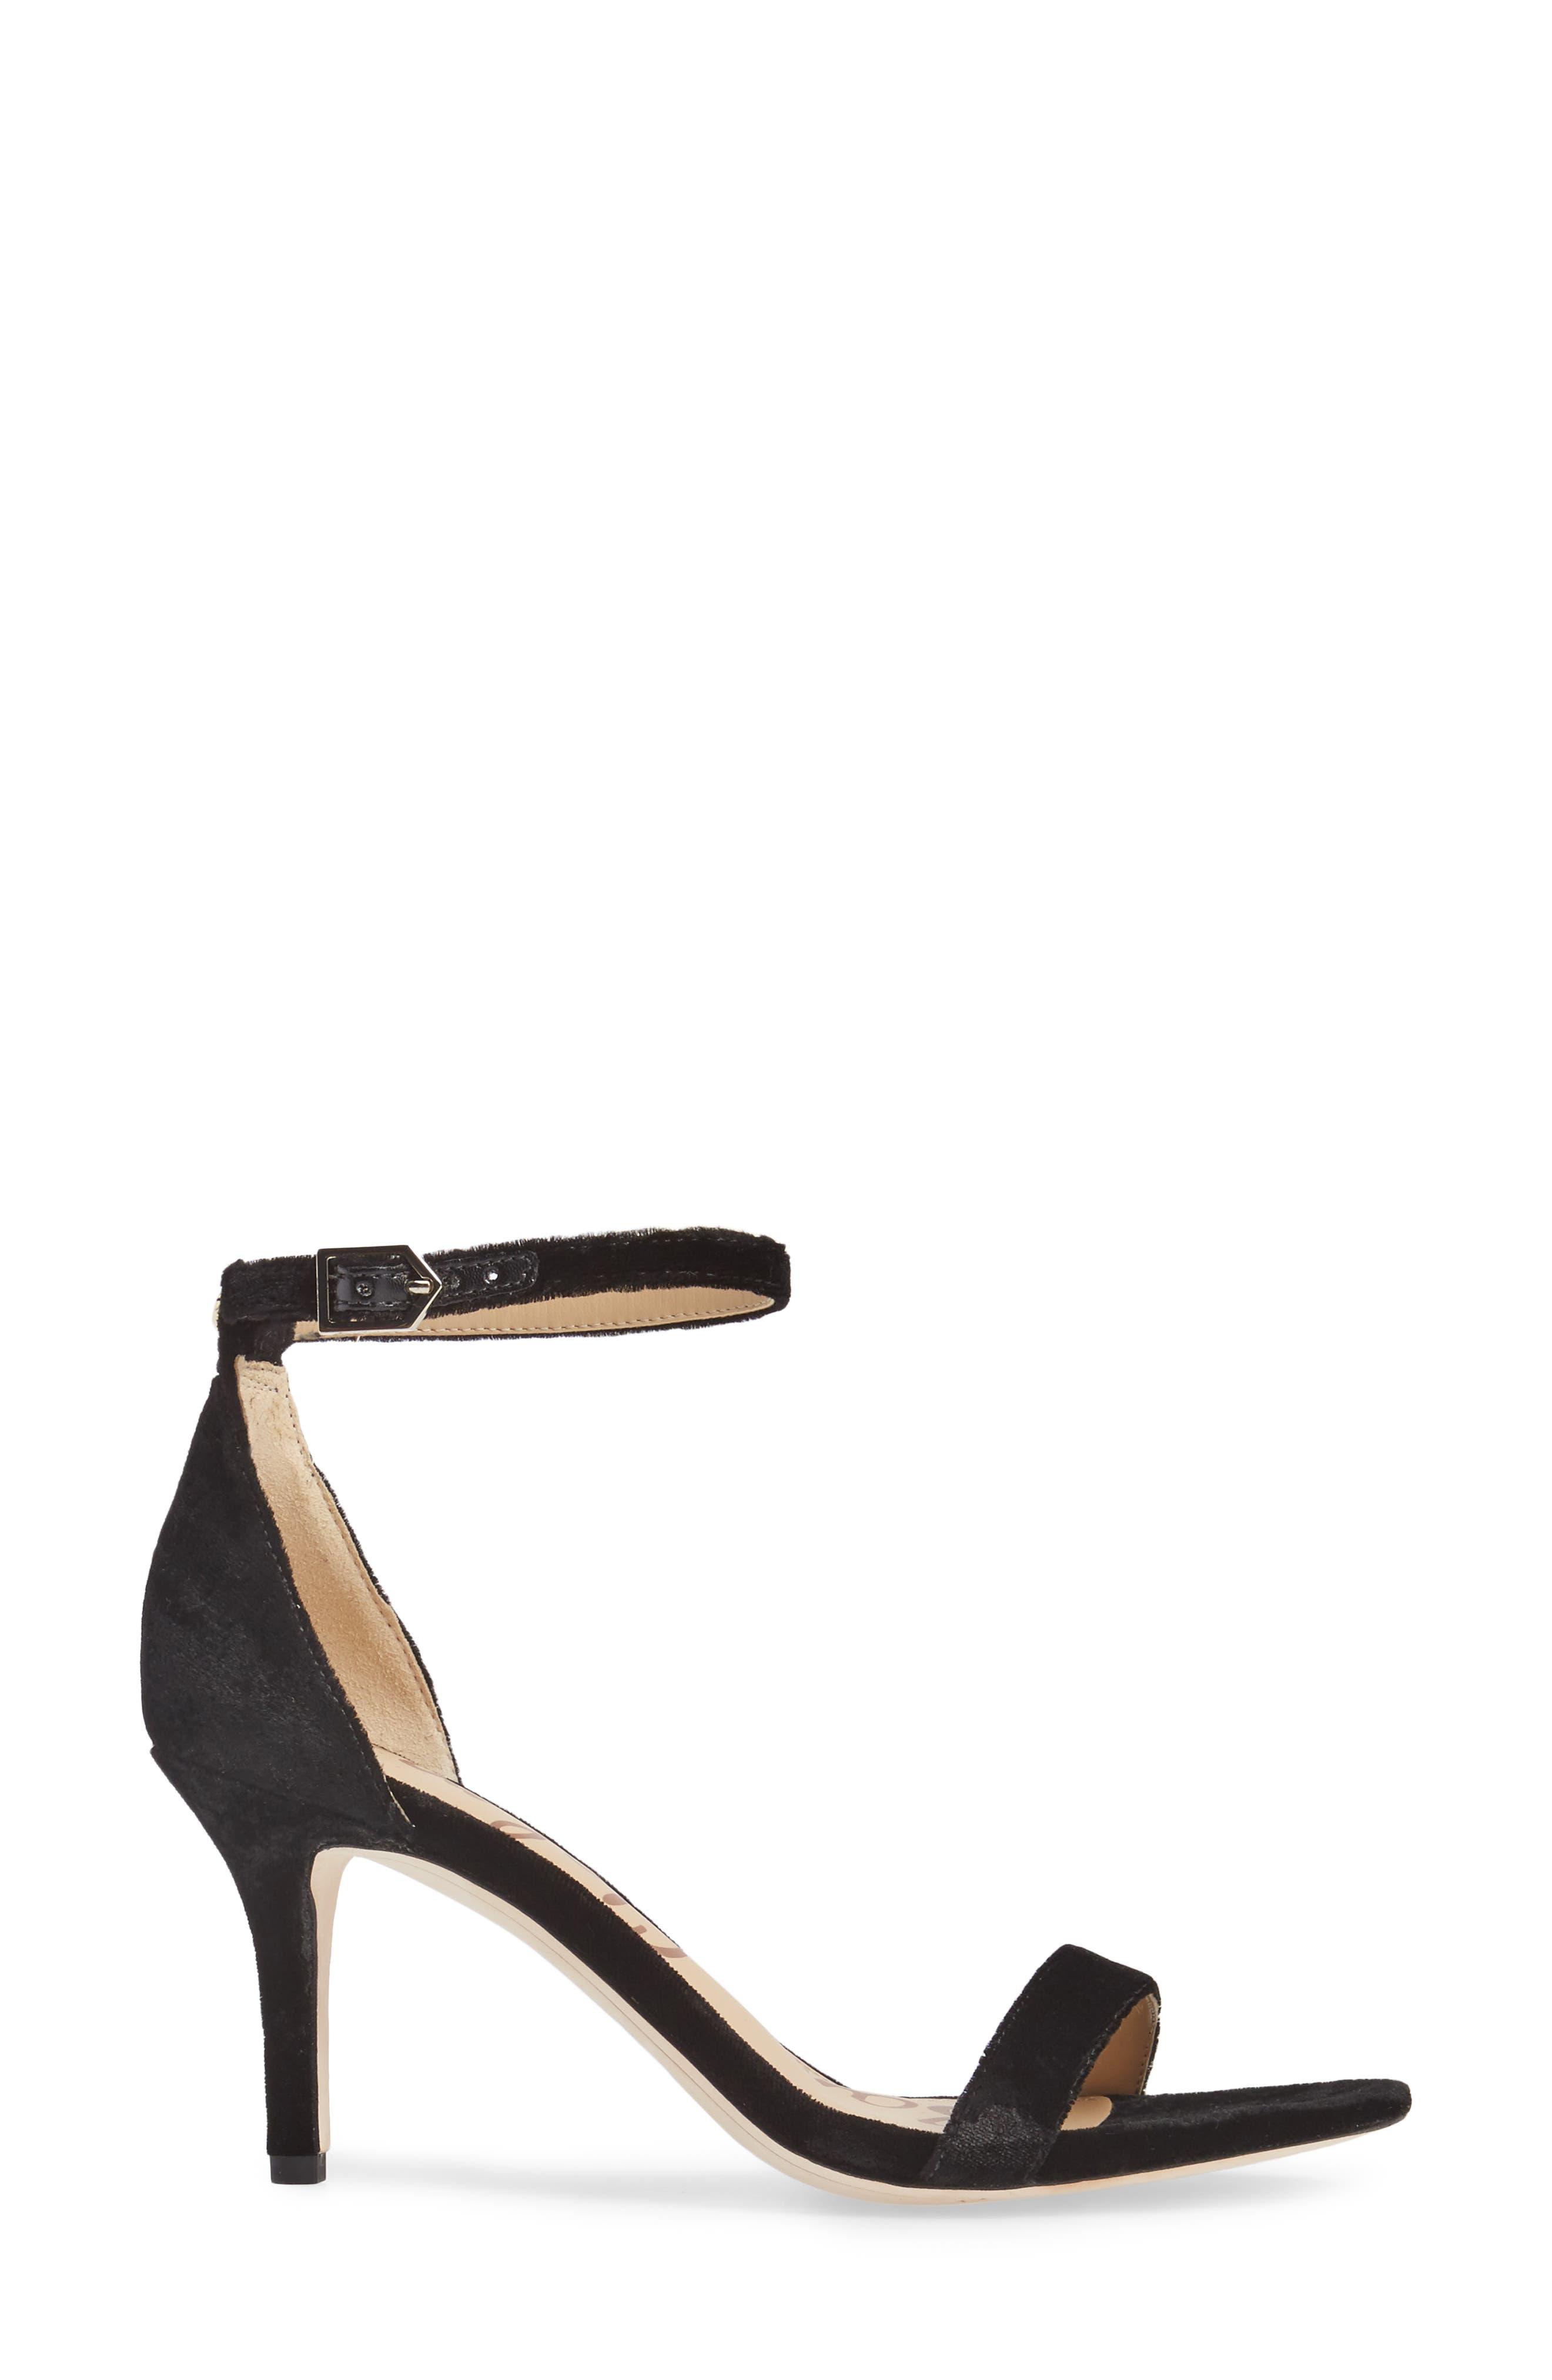 ,                             'Patti' Ankle Strap Sandal,                             Alternate thumbnail 9, color,                             006